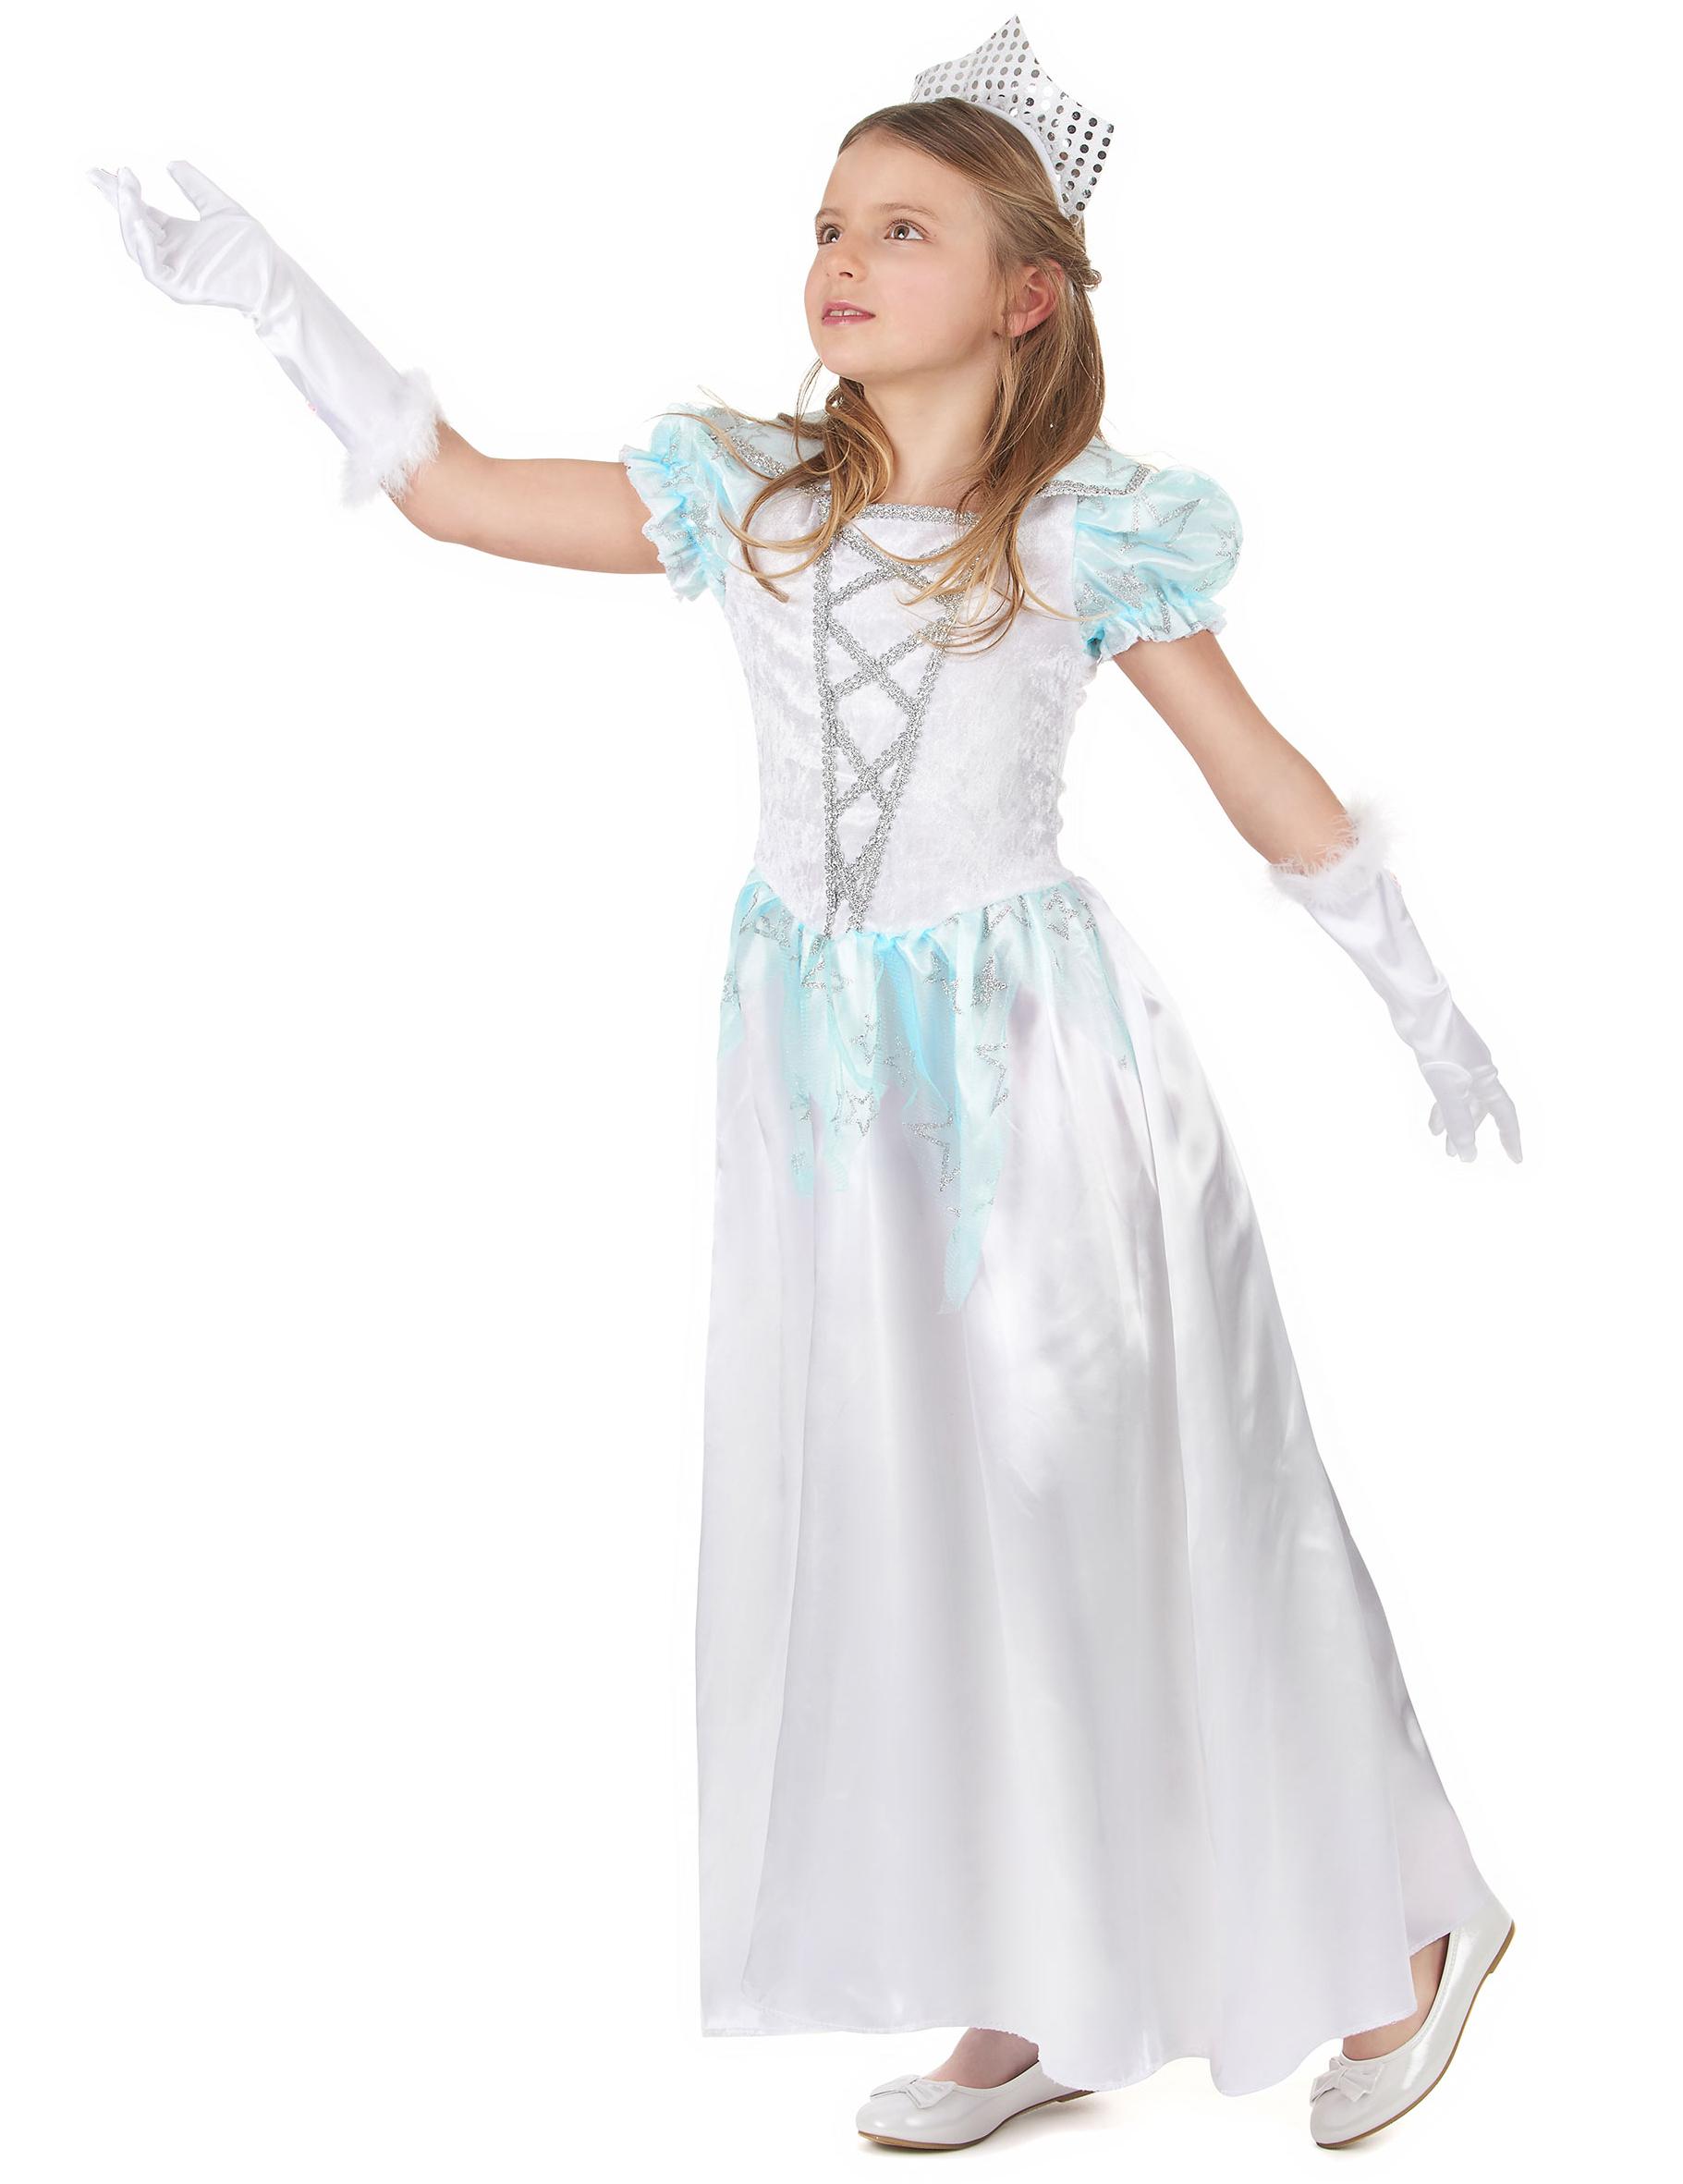 Costume principessa bianca bambina  Costumi bambini 0d8d76f1278